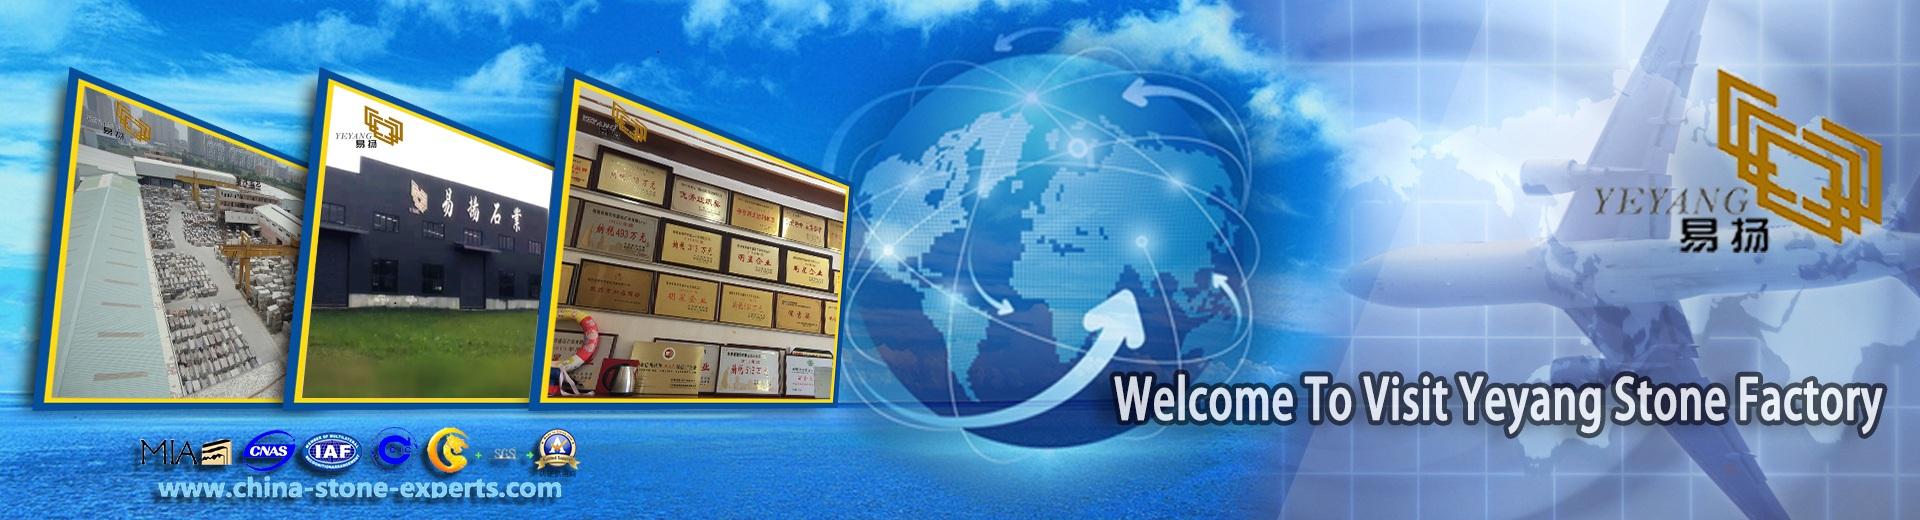 China Stone Factory ——Xiamen Yeyang Import & Export Co., Ltd.